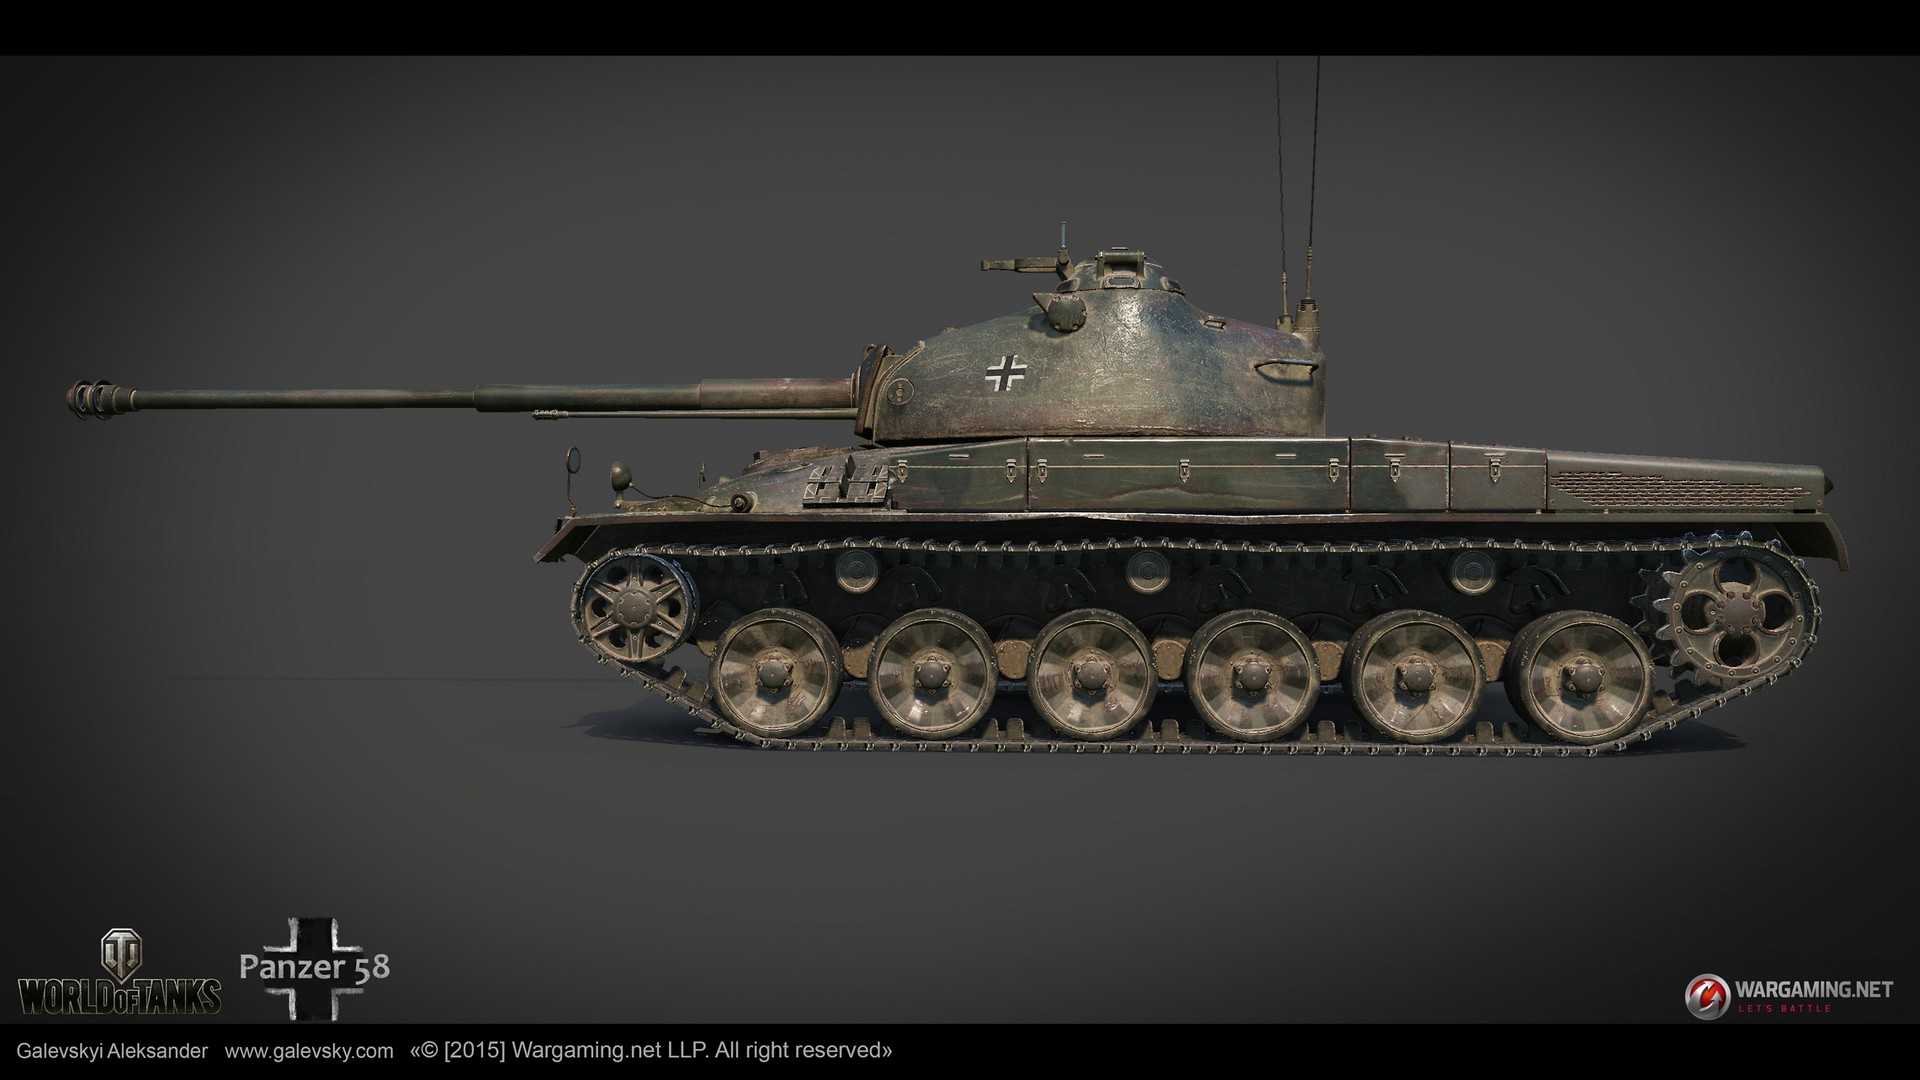 Aleksander galevskyi panzer 58 04 med